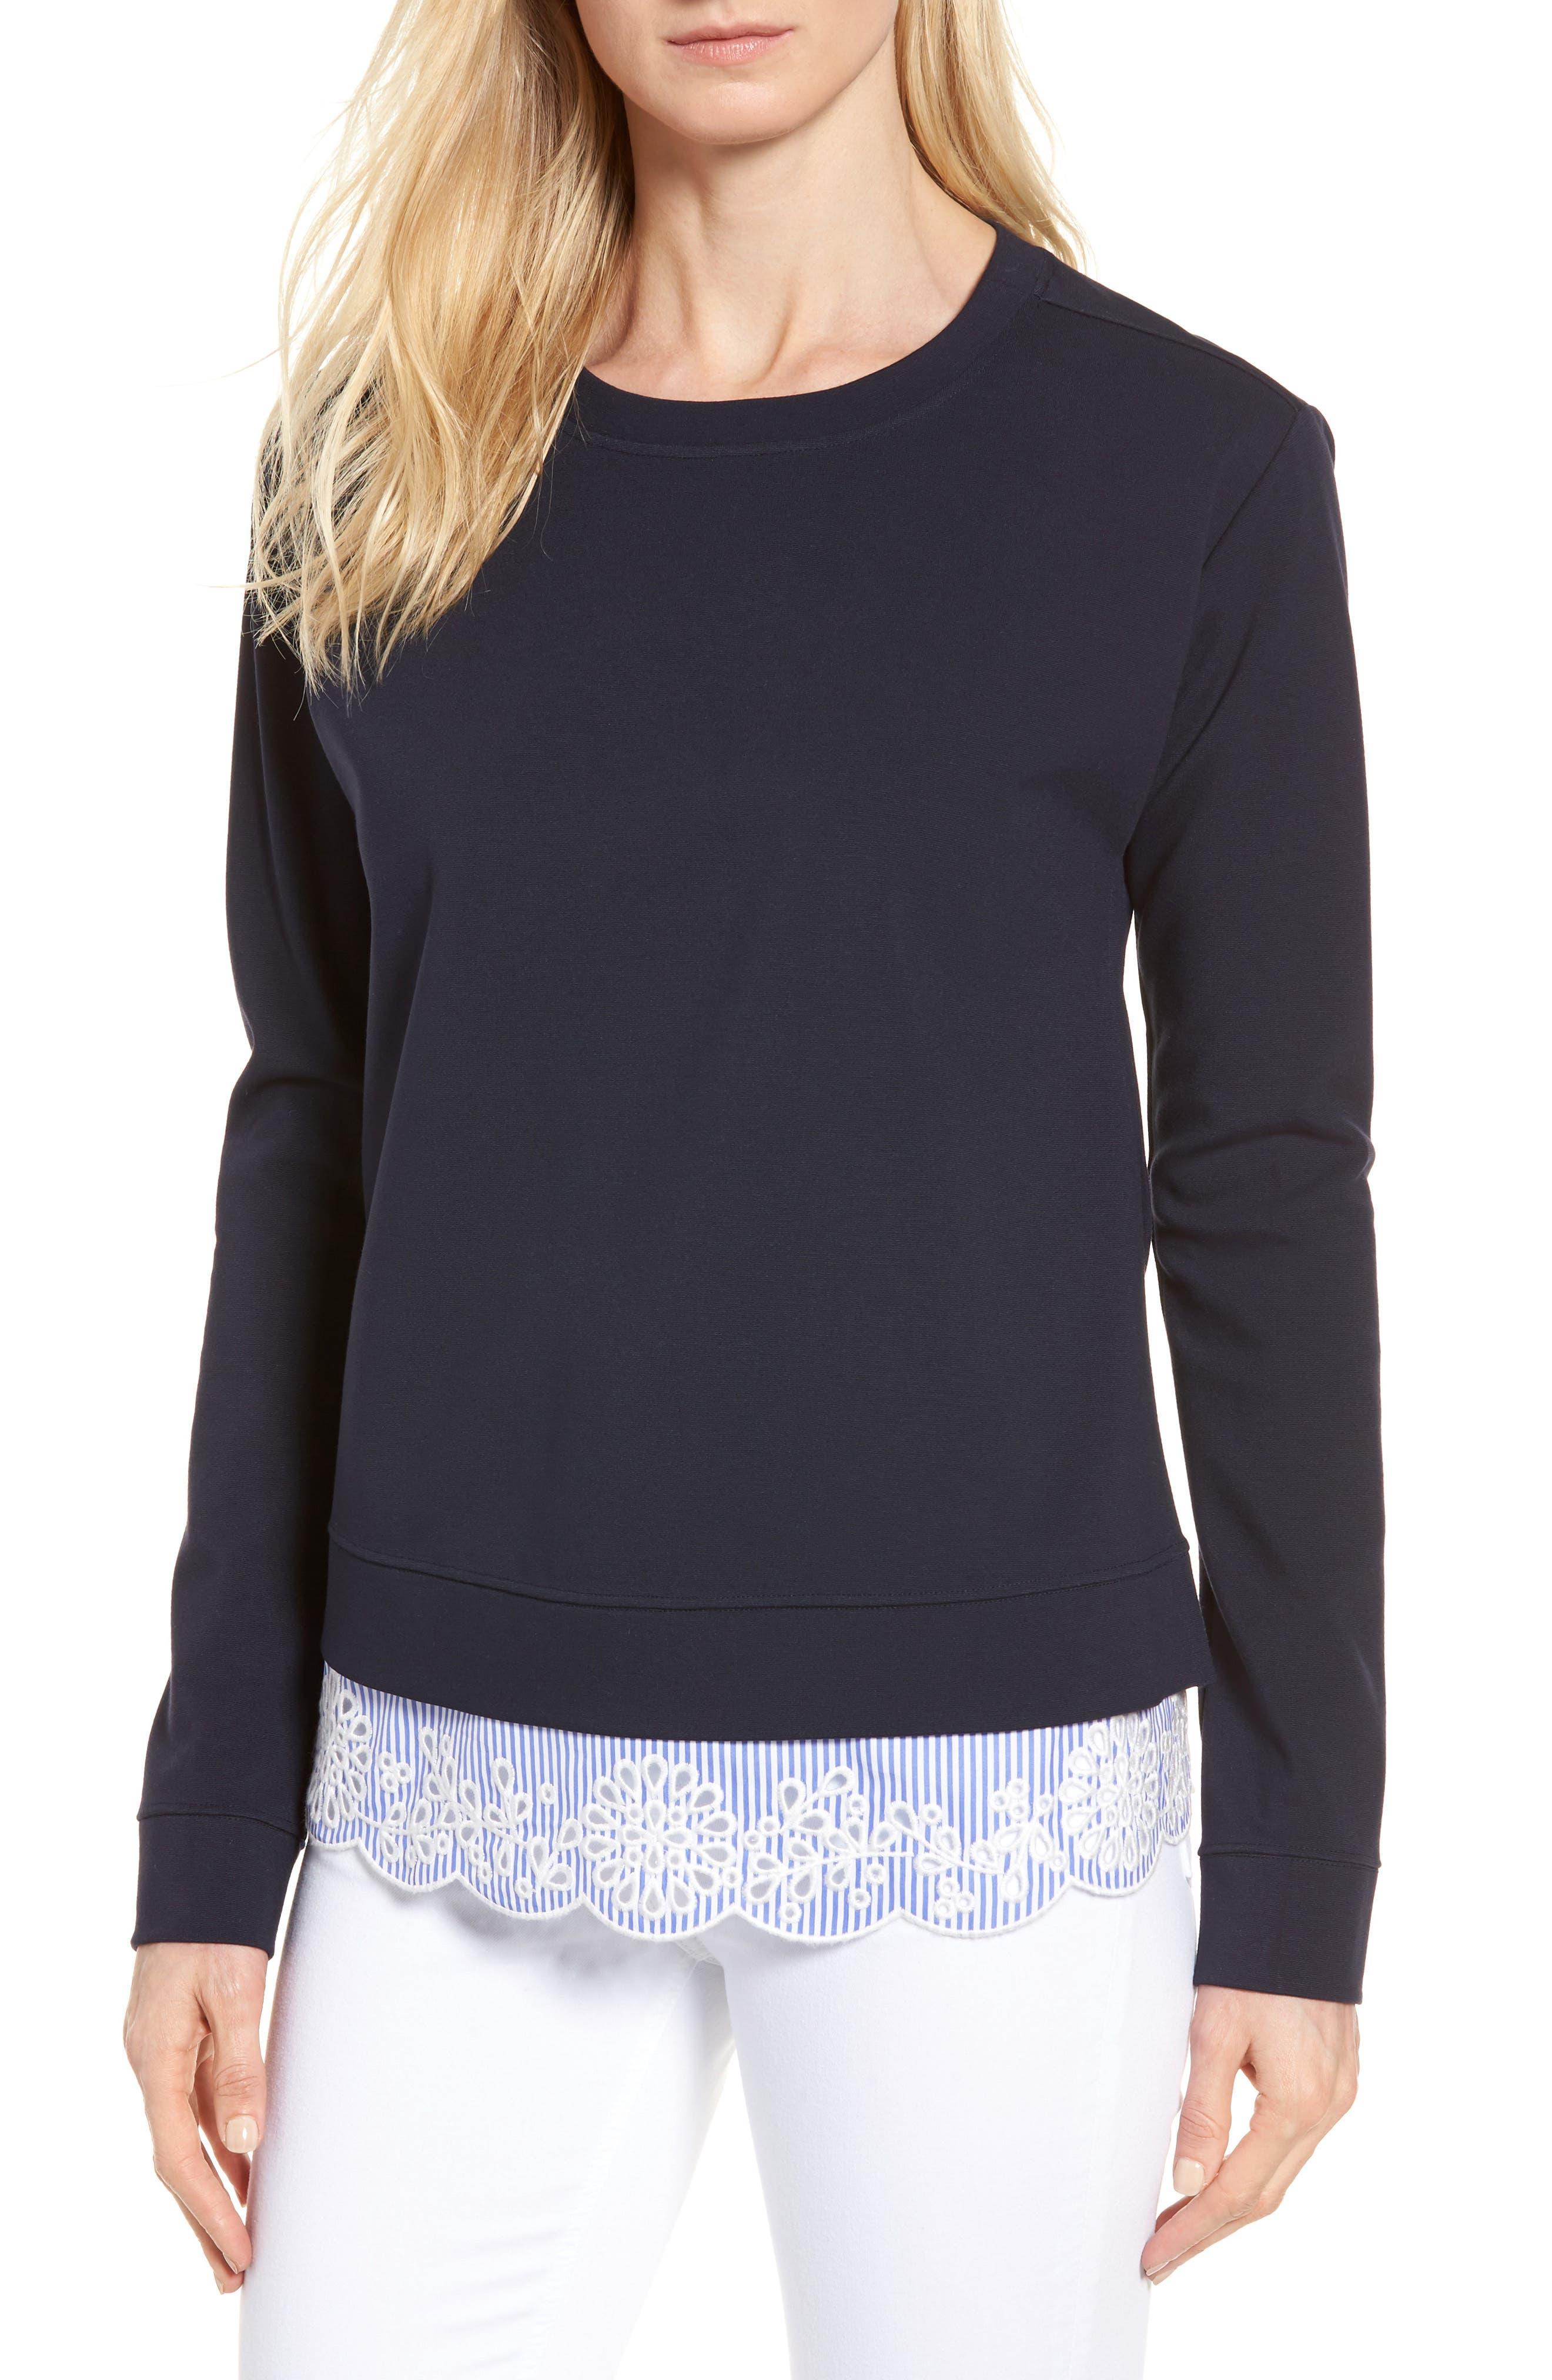 Main Image - Nordstrom Signature Woven Inset Ponte Knit Sweatshirt